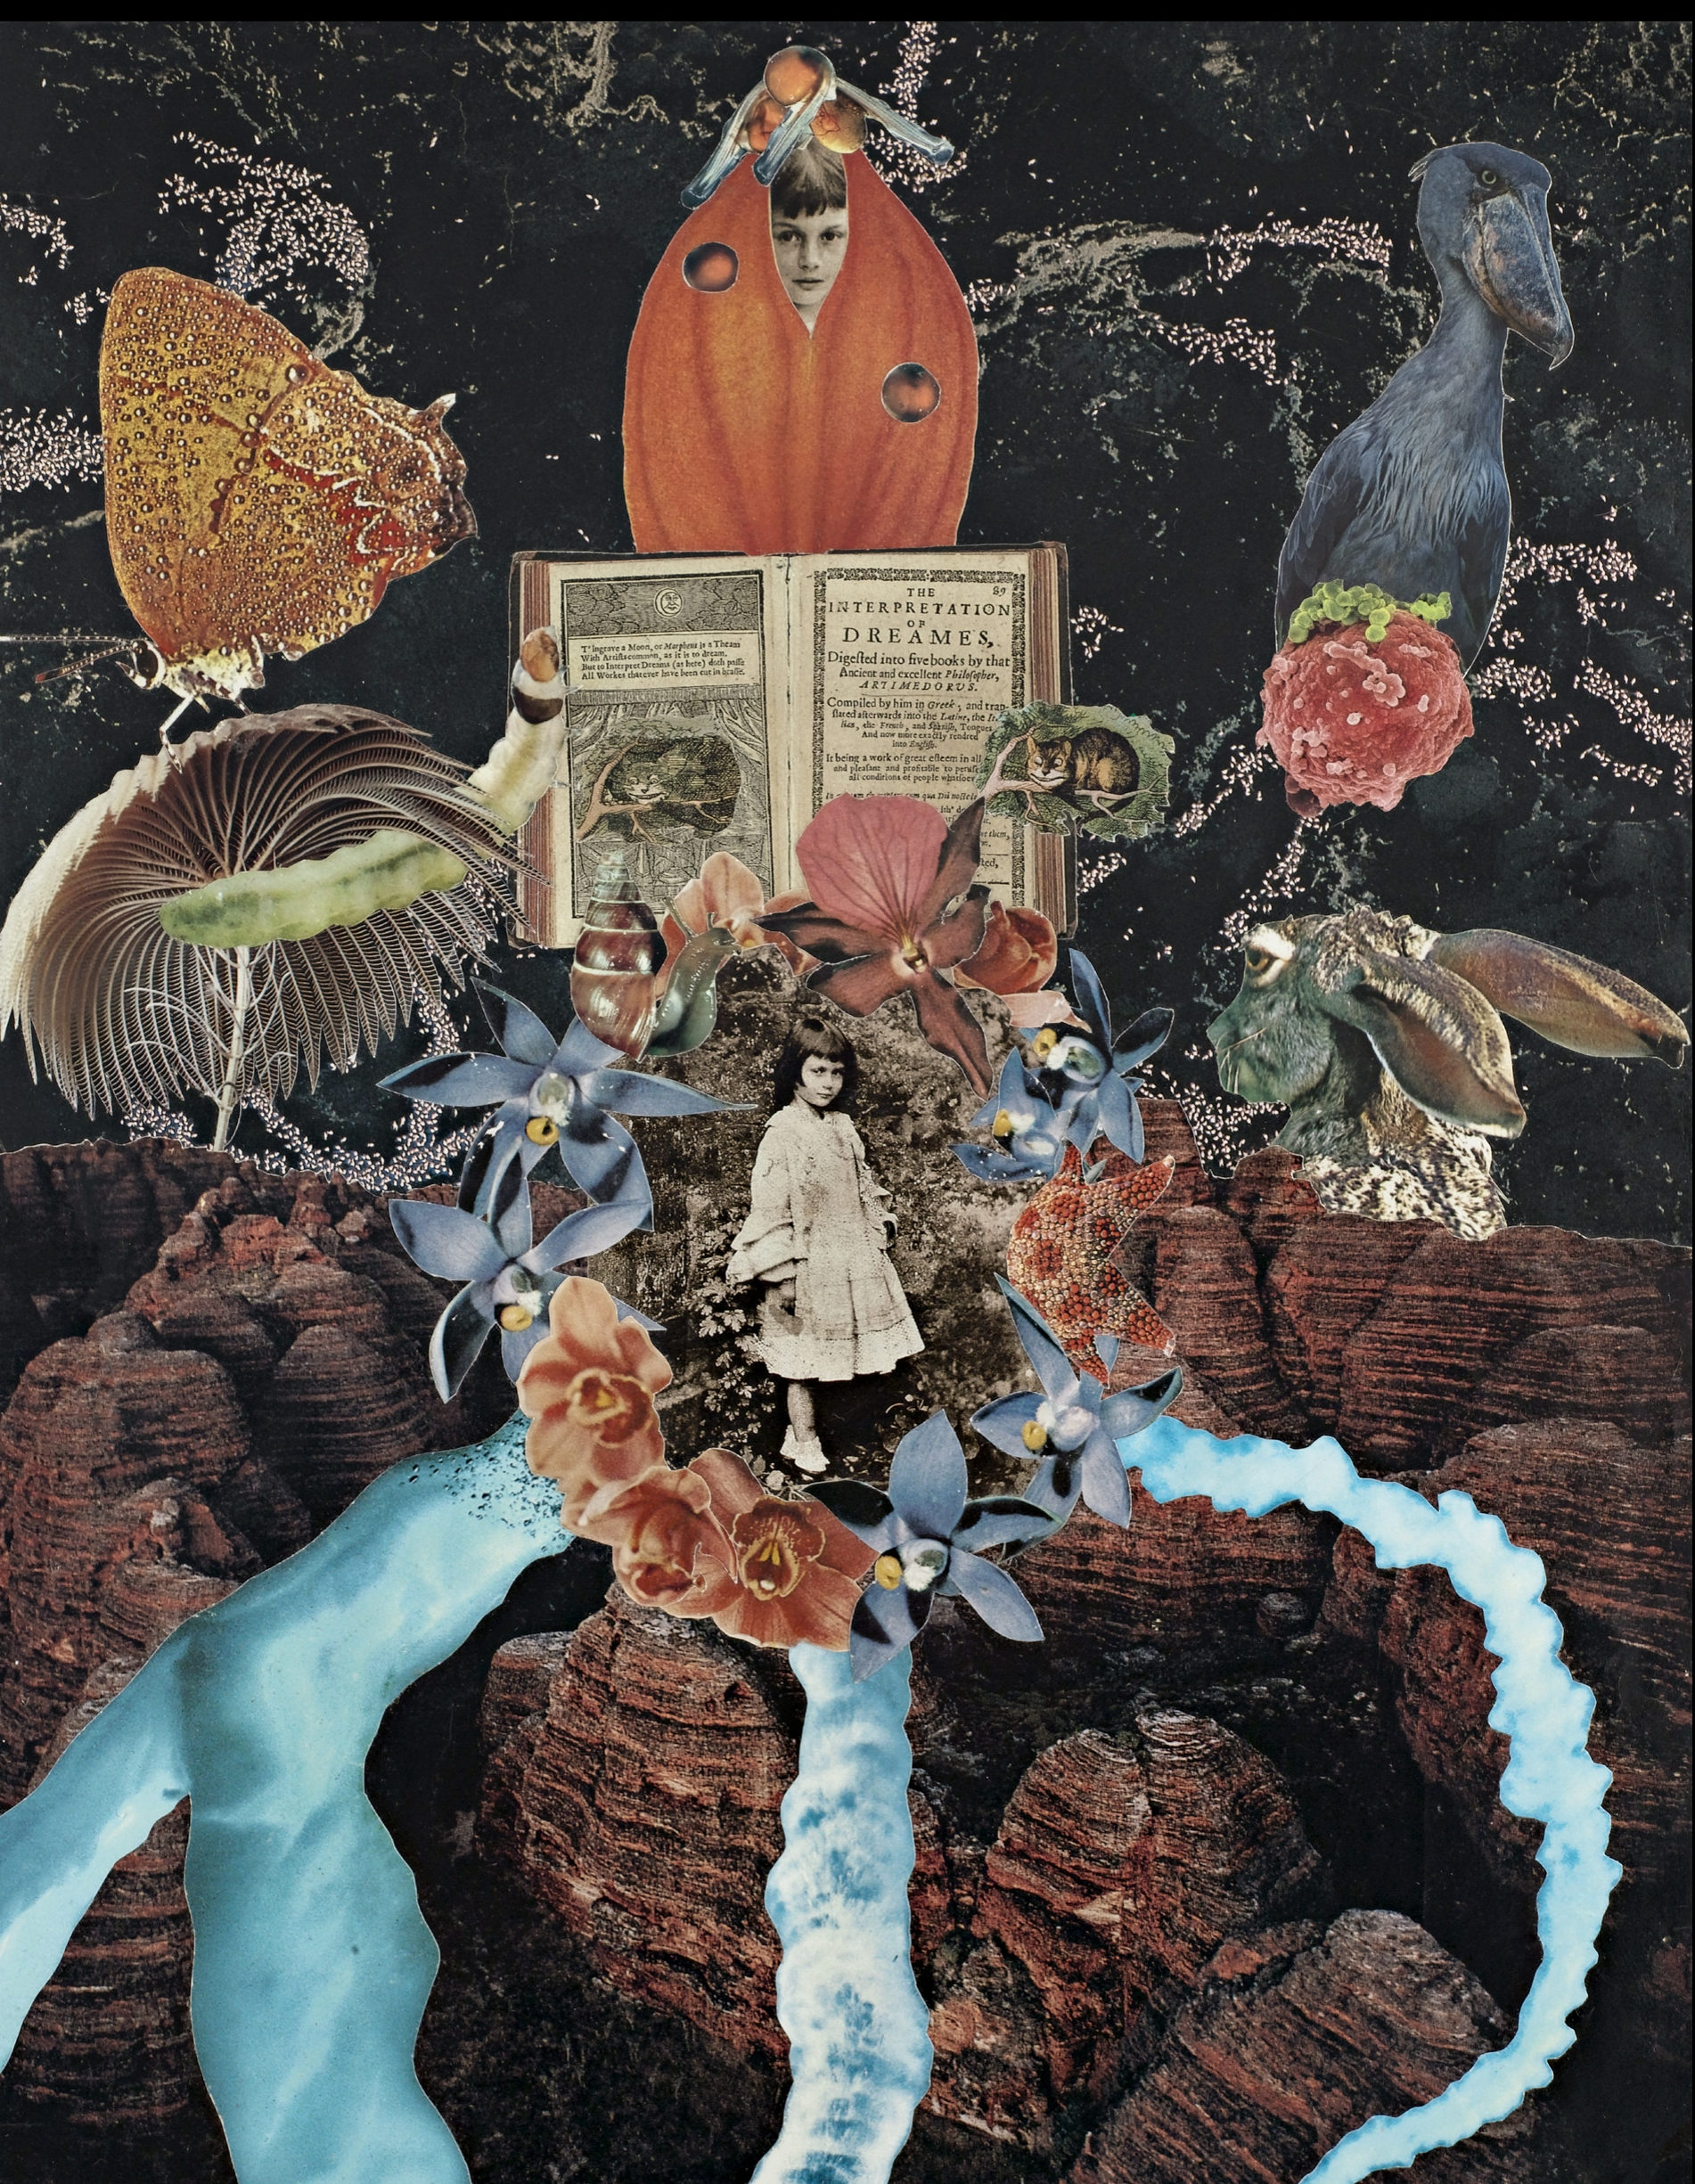 Agnieszka Sosnowska, Journey, Collage, 1994